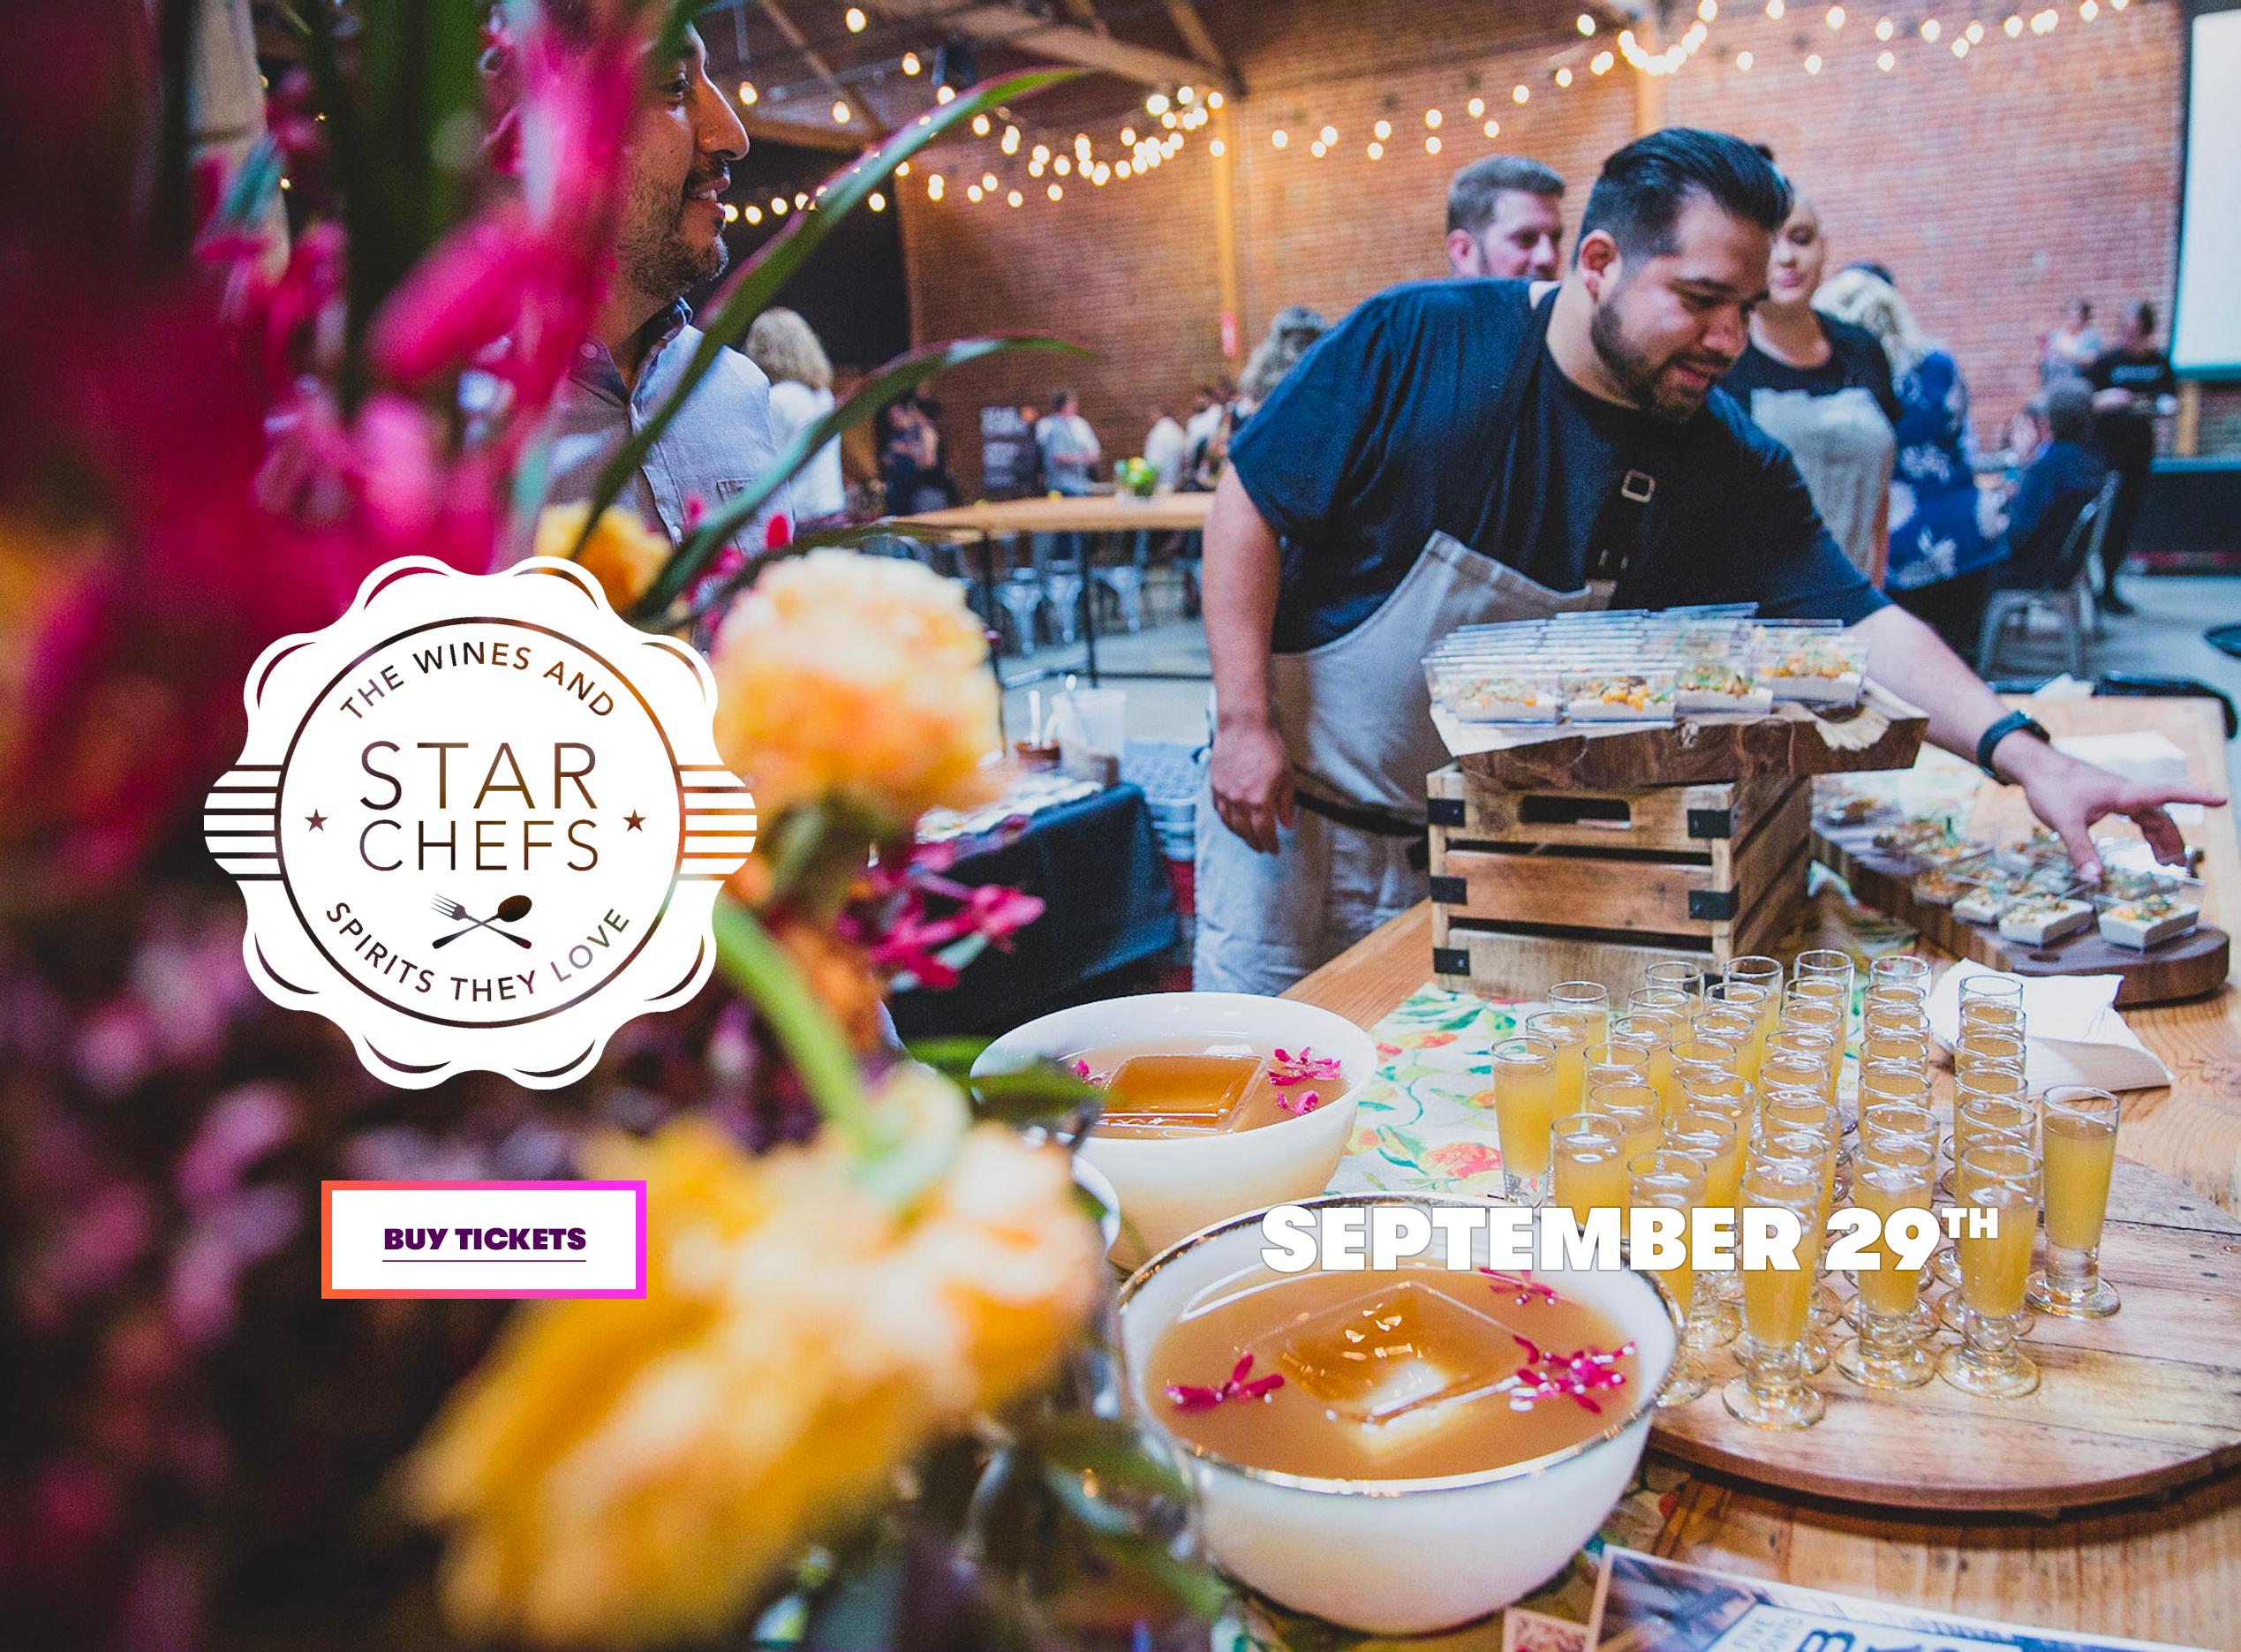 Star Chefs Pivotal Foster Kids Event San Jose